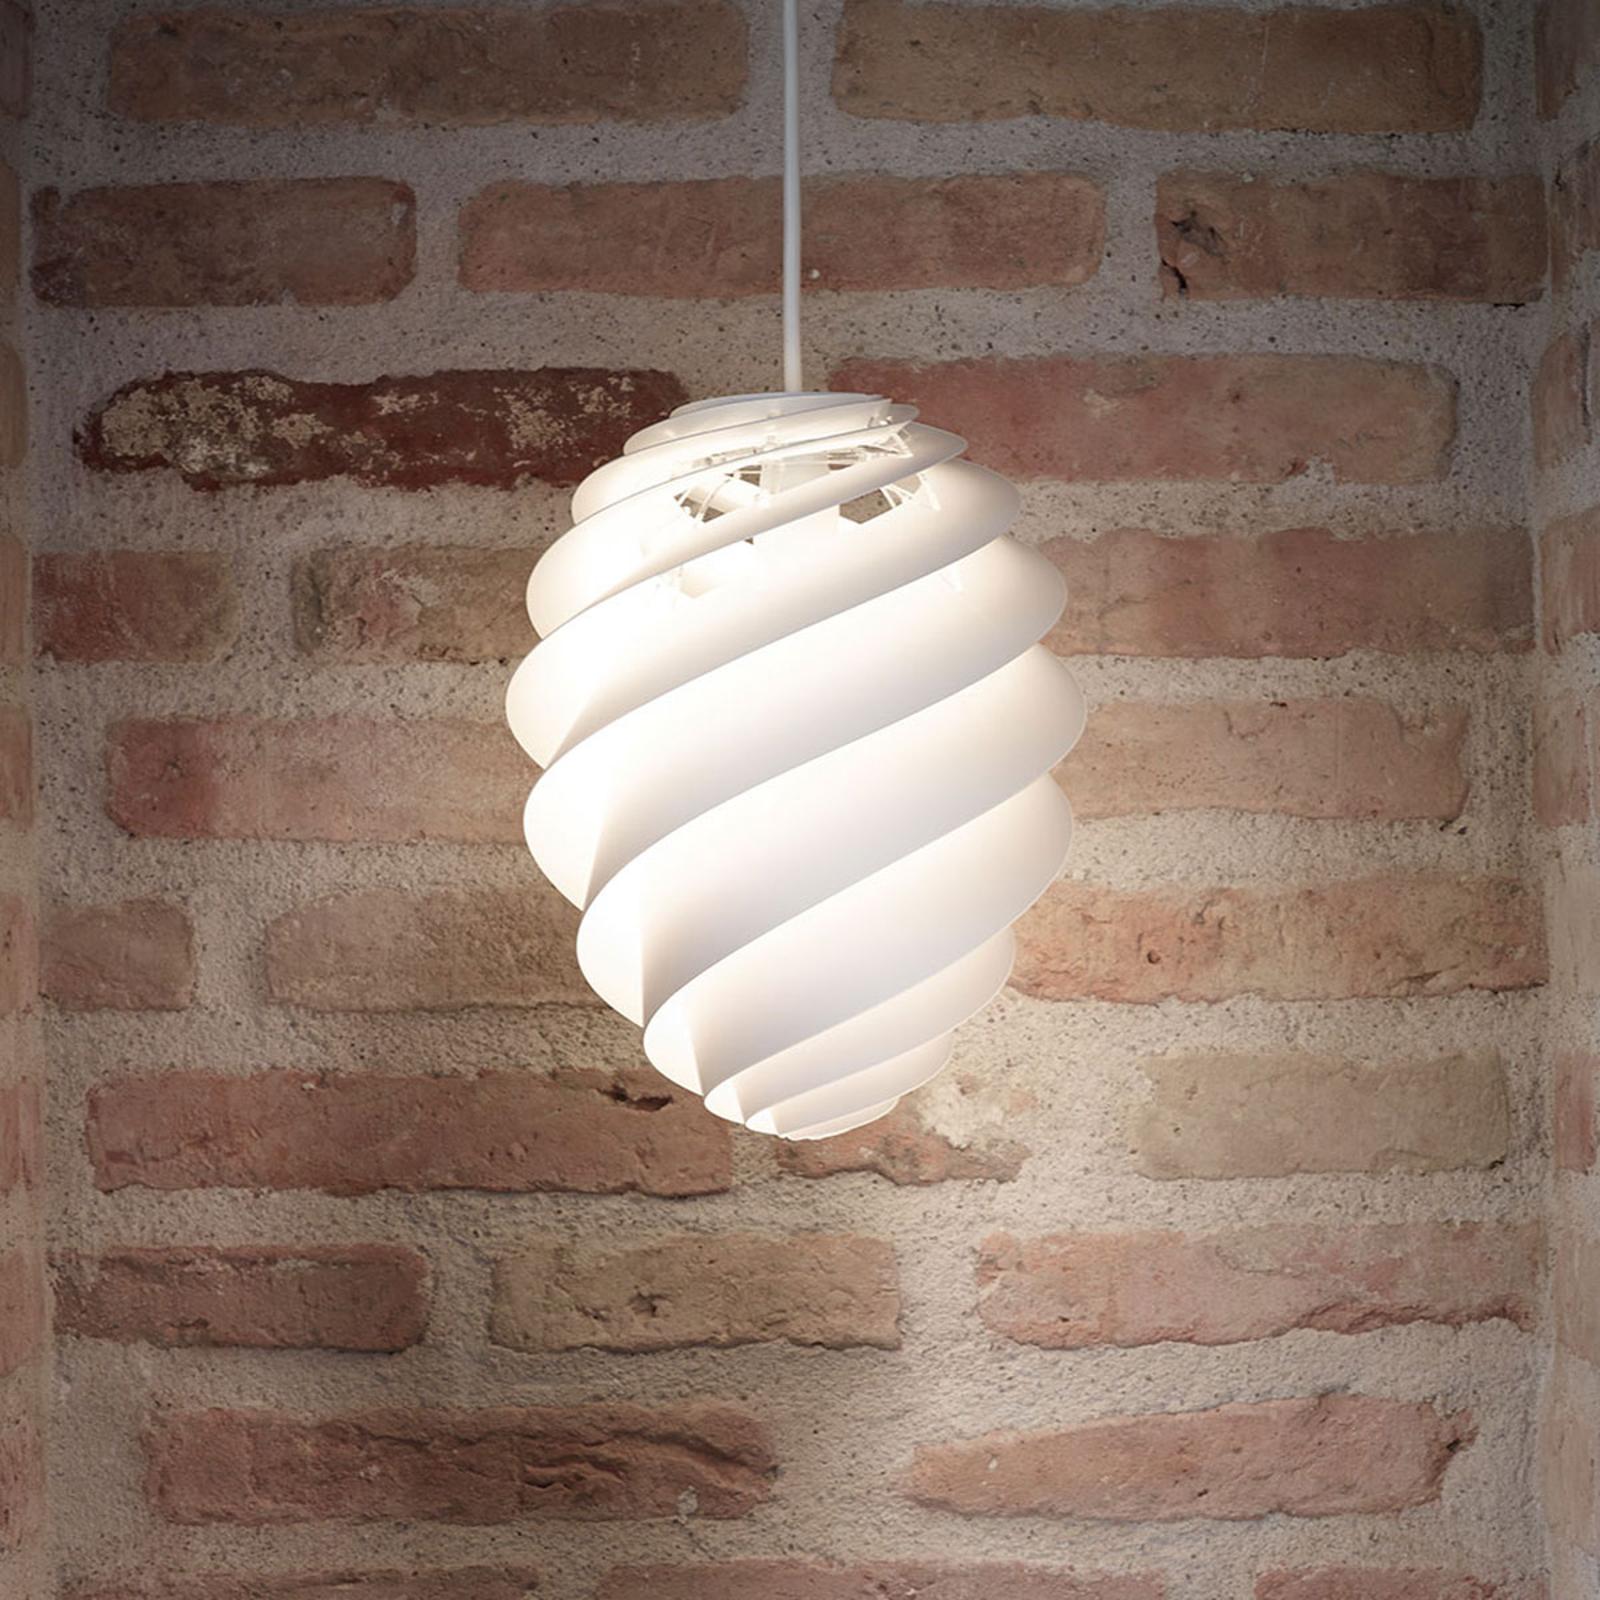 LE KLINT Swirl 2 Small, biała lampa wisząca